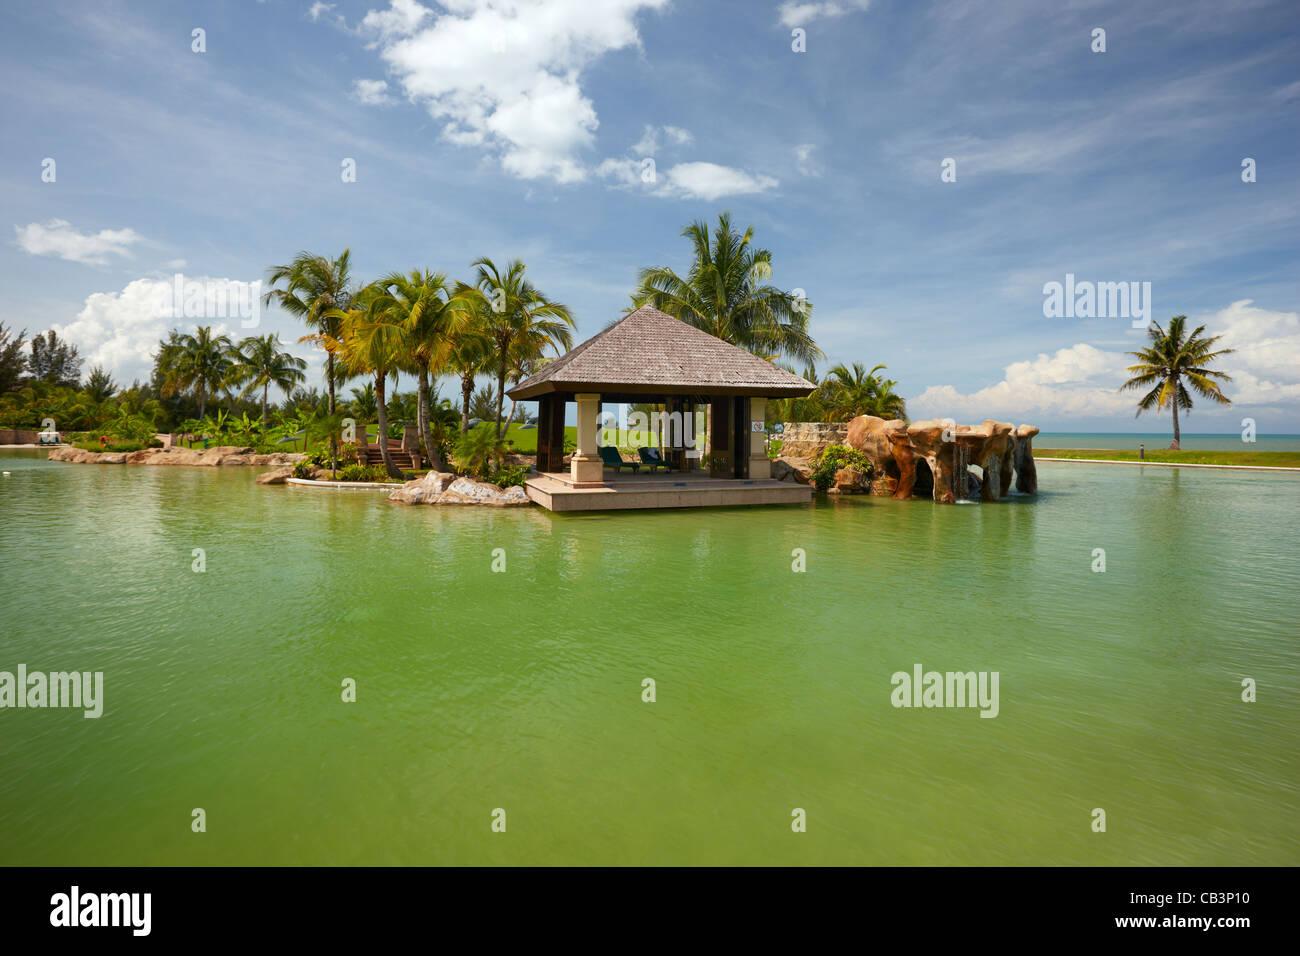 El Hotel Empire, Jerudong, Brunei Darussalam, Borneo, Asia Foto de stock